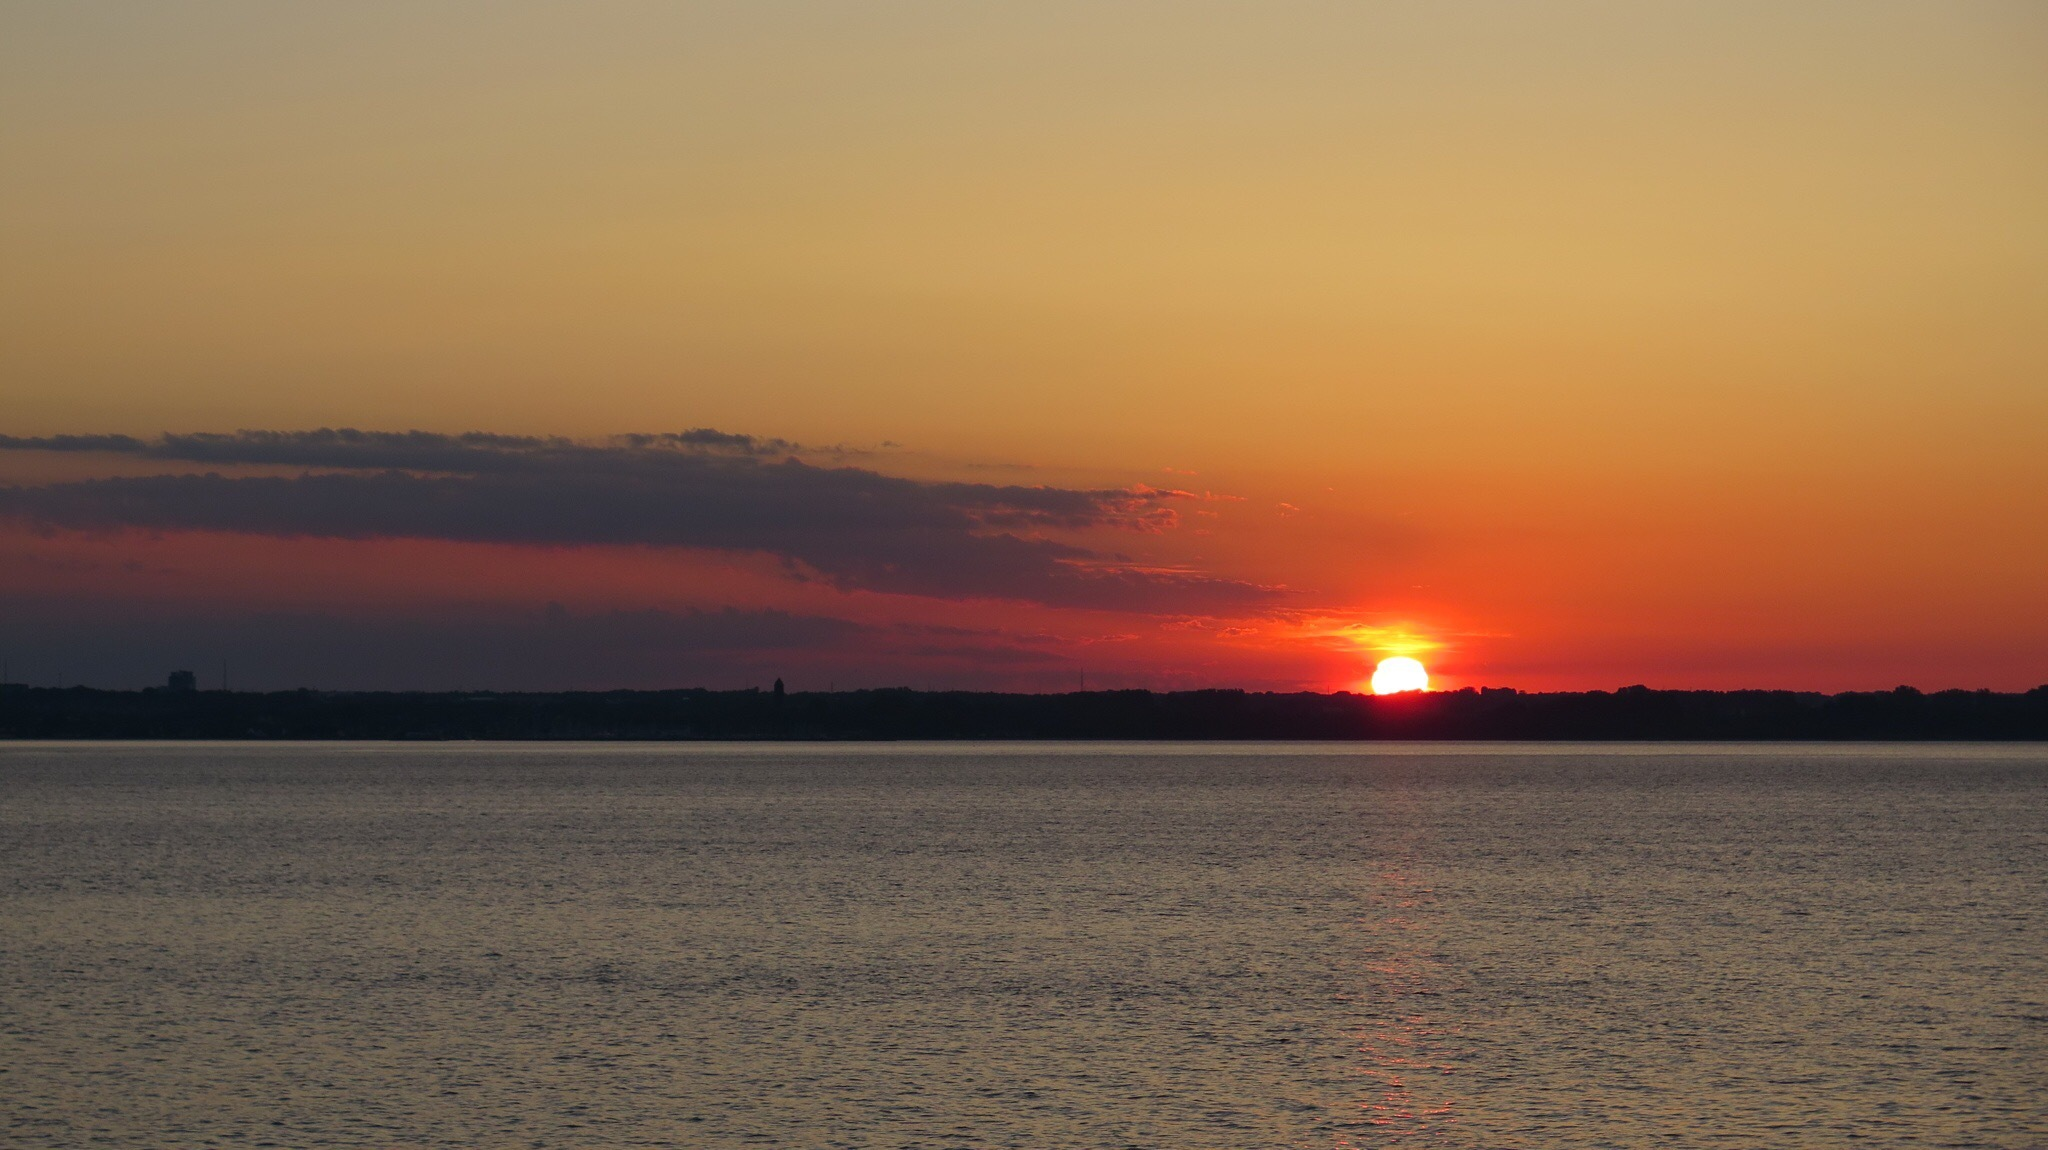 sundown by Terry Reynolds